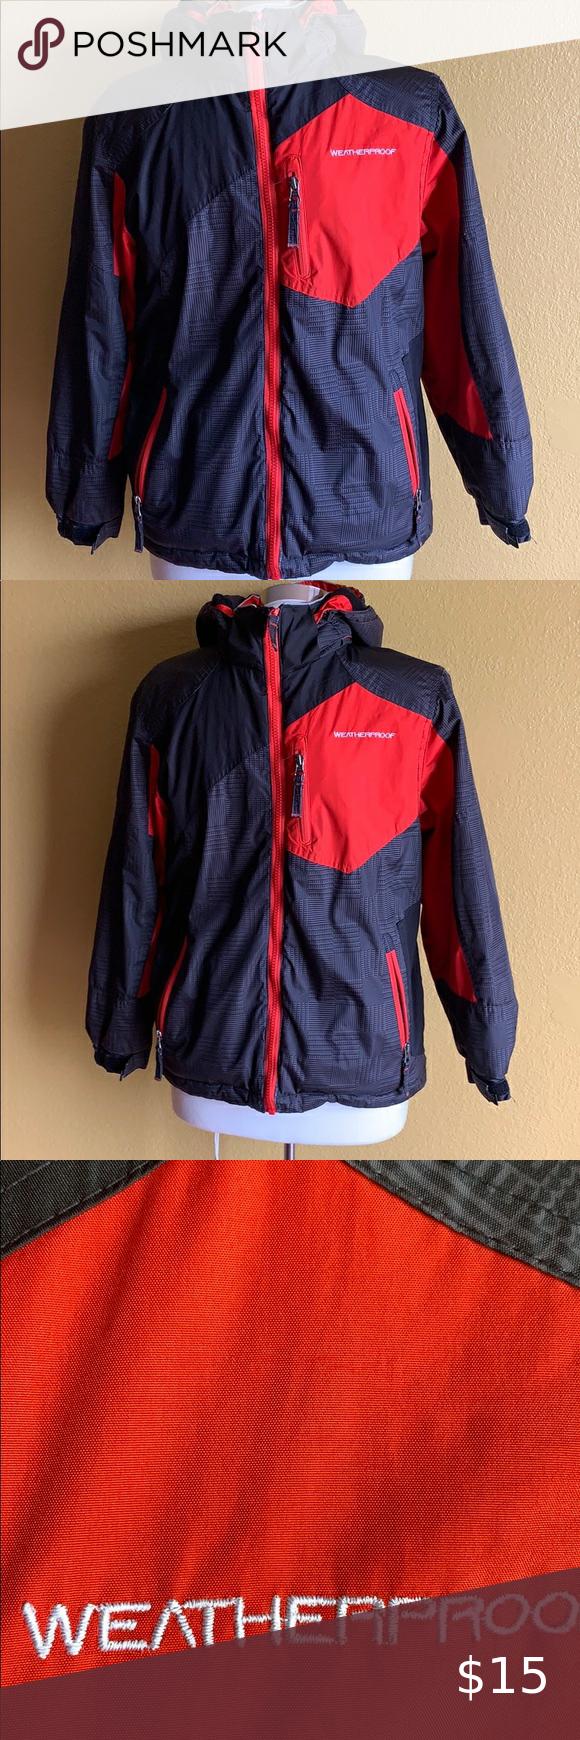 Weatherproof Boys Coat Size Medium Boys Coat Weatherproof Jacket Kids Jacket [ 1740 x 580 Pixel ]